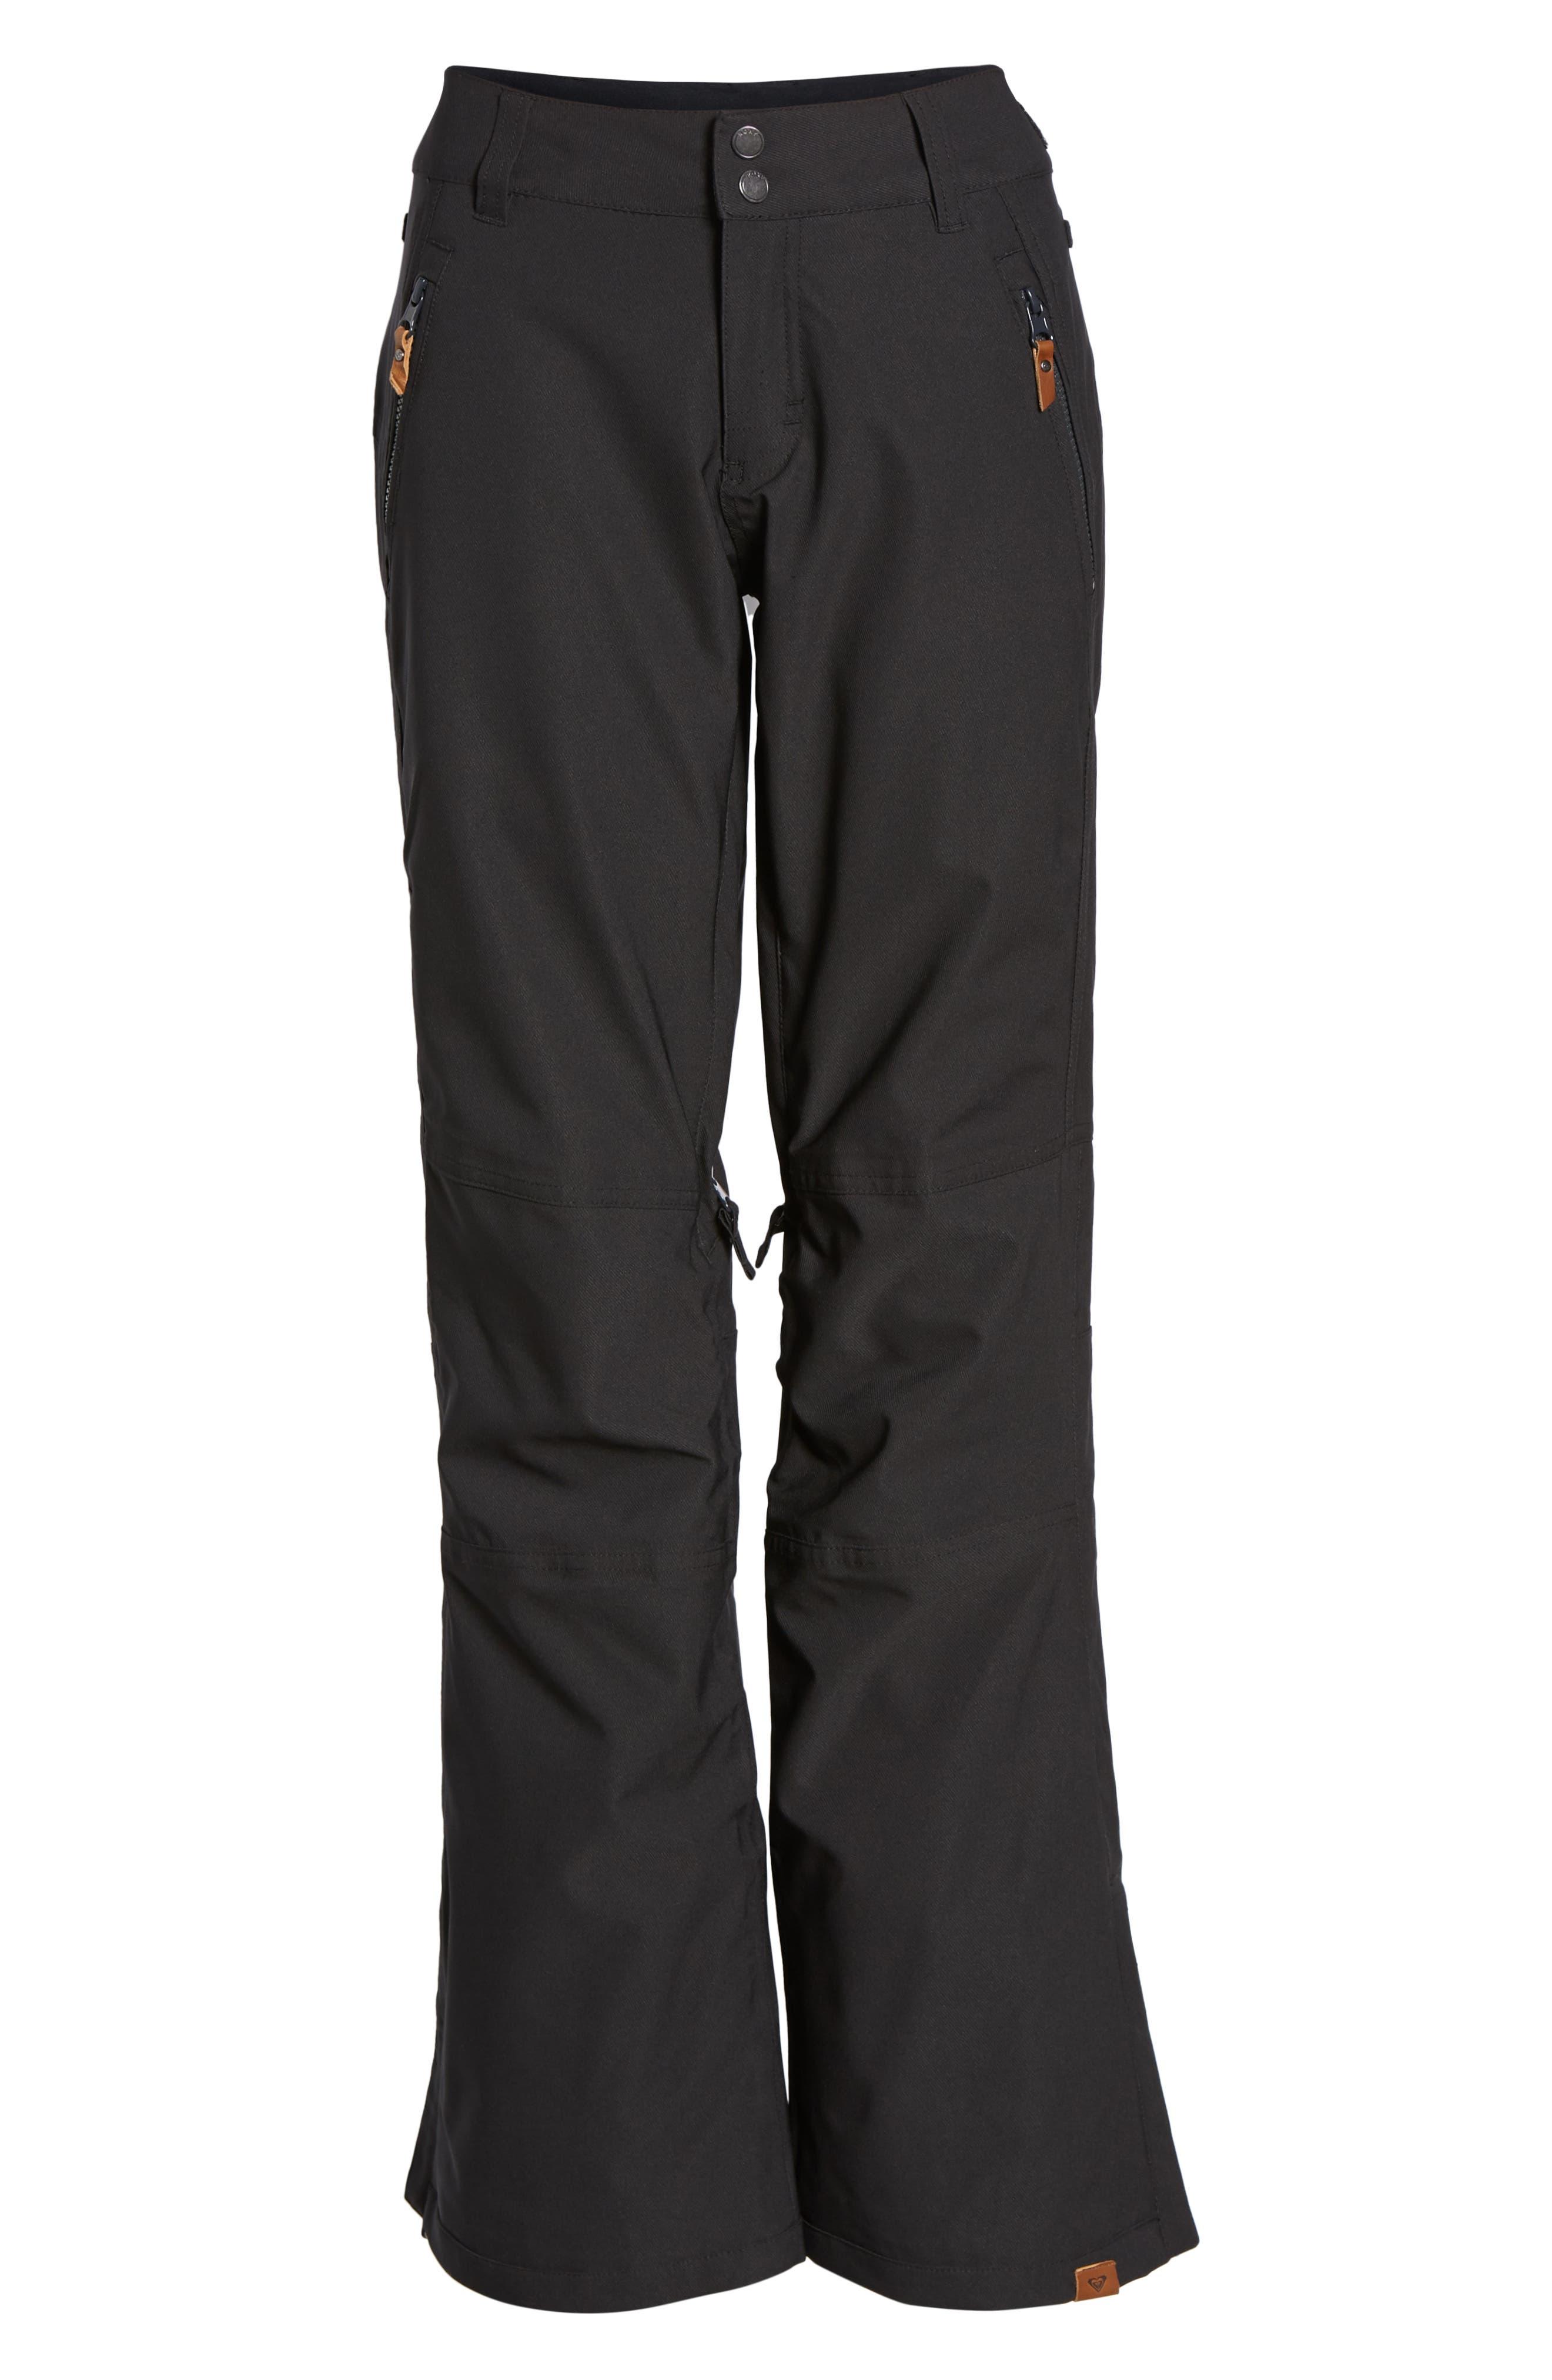 Cabin Snow Pants,                             Alternate thumbnail 4, color,                             TRUE BLACK